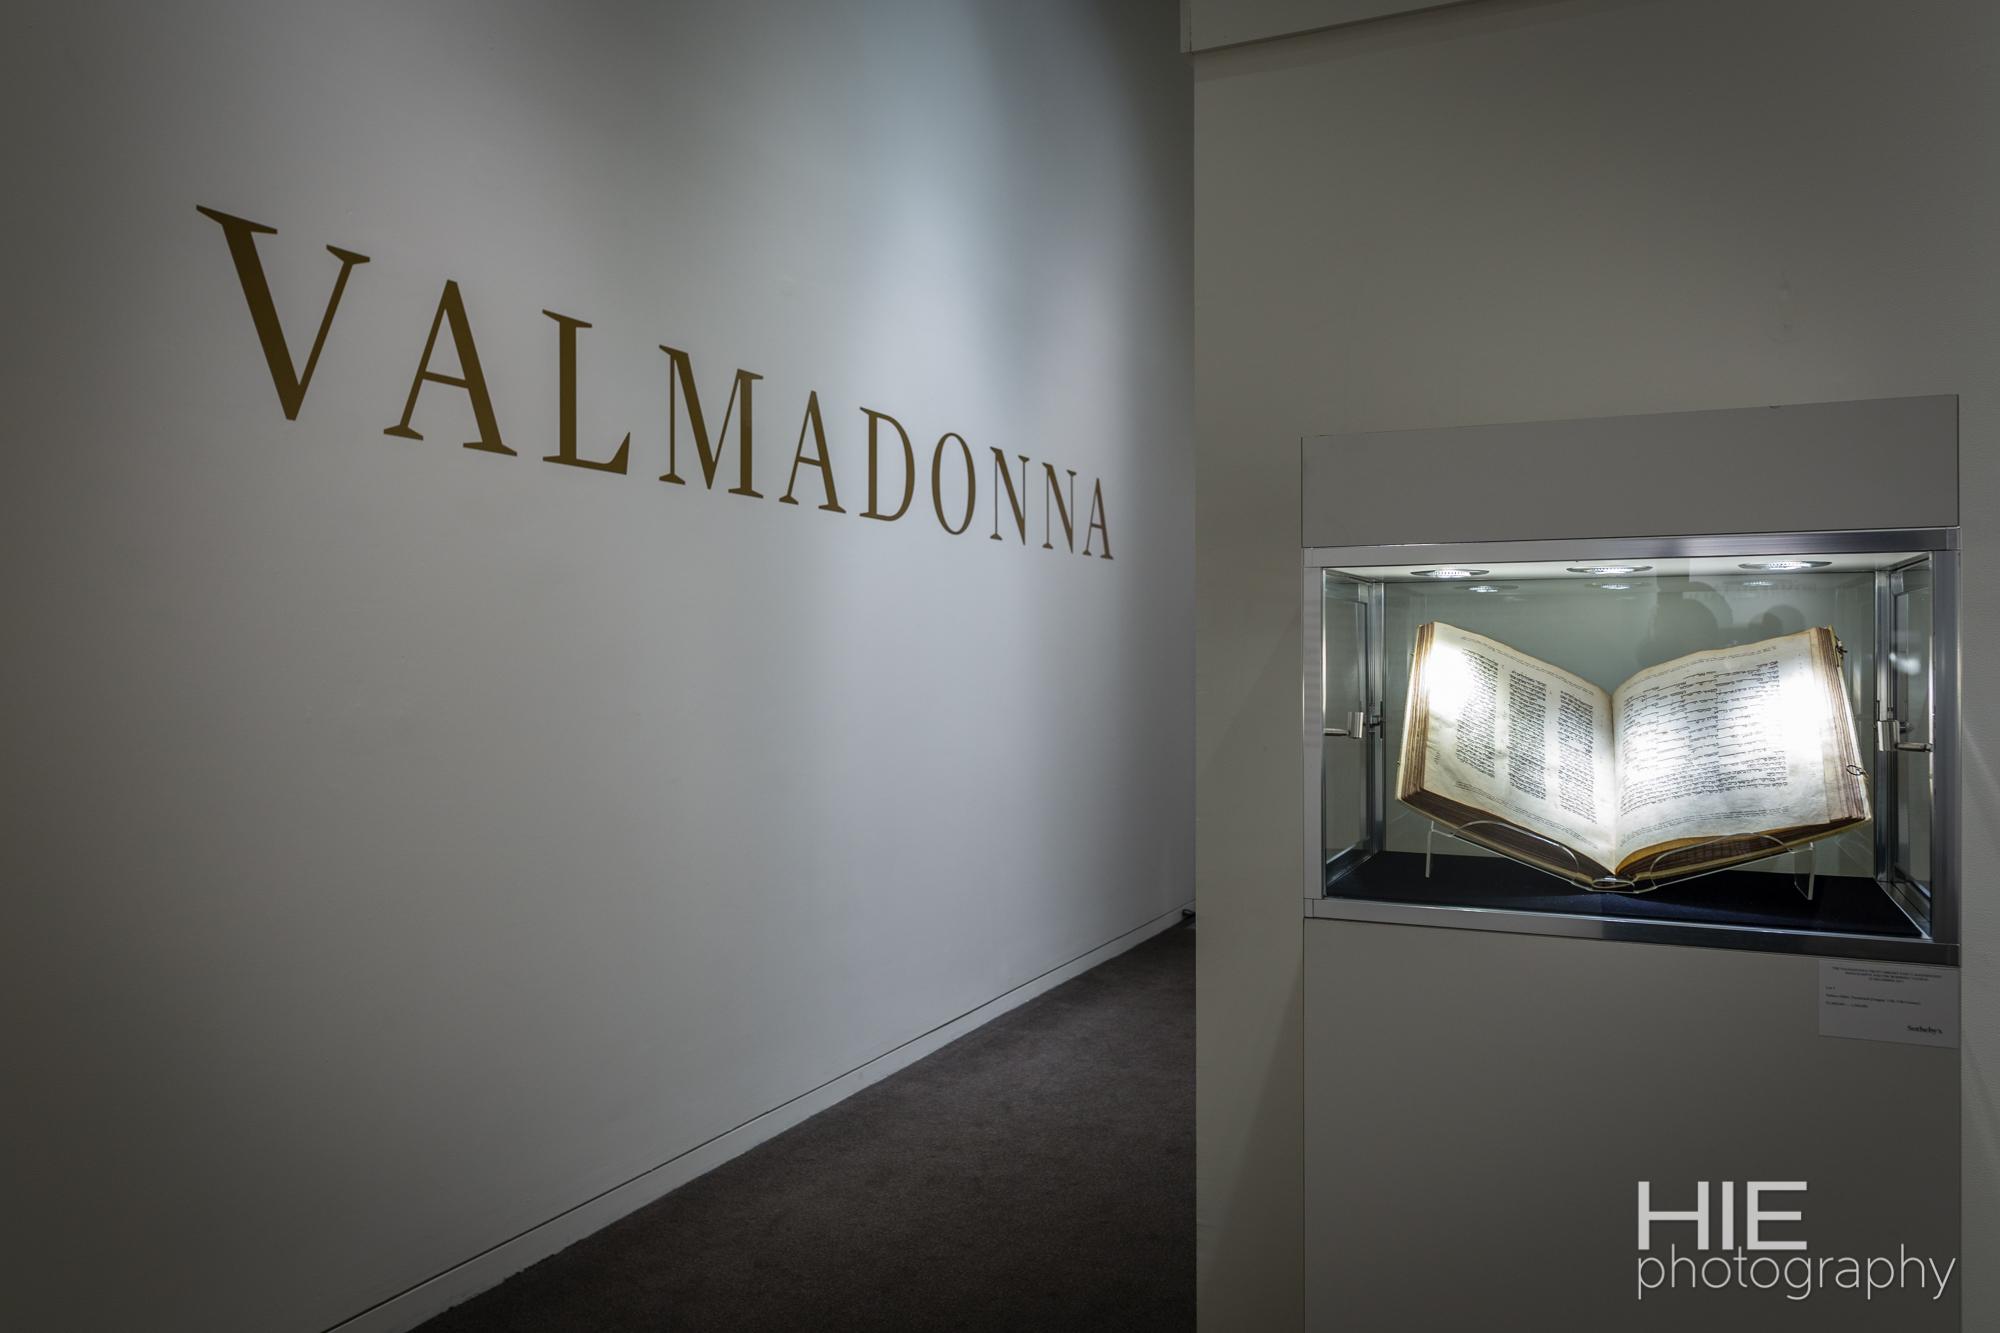 Valmadonna-1.jpg